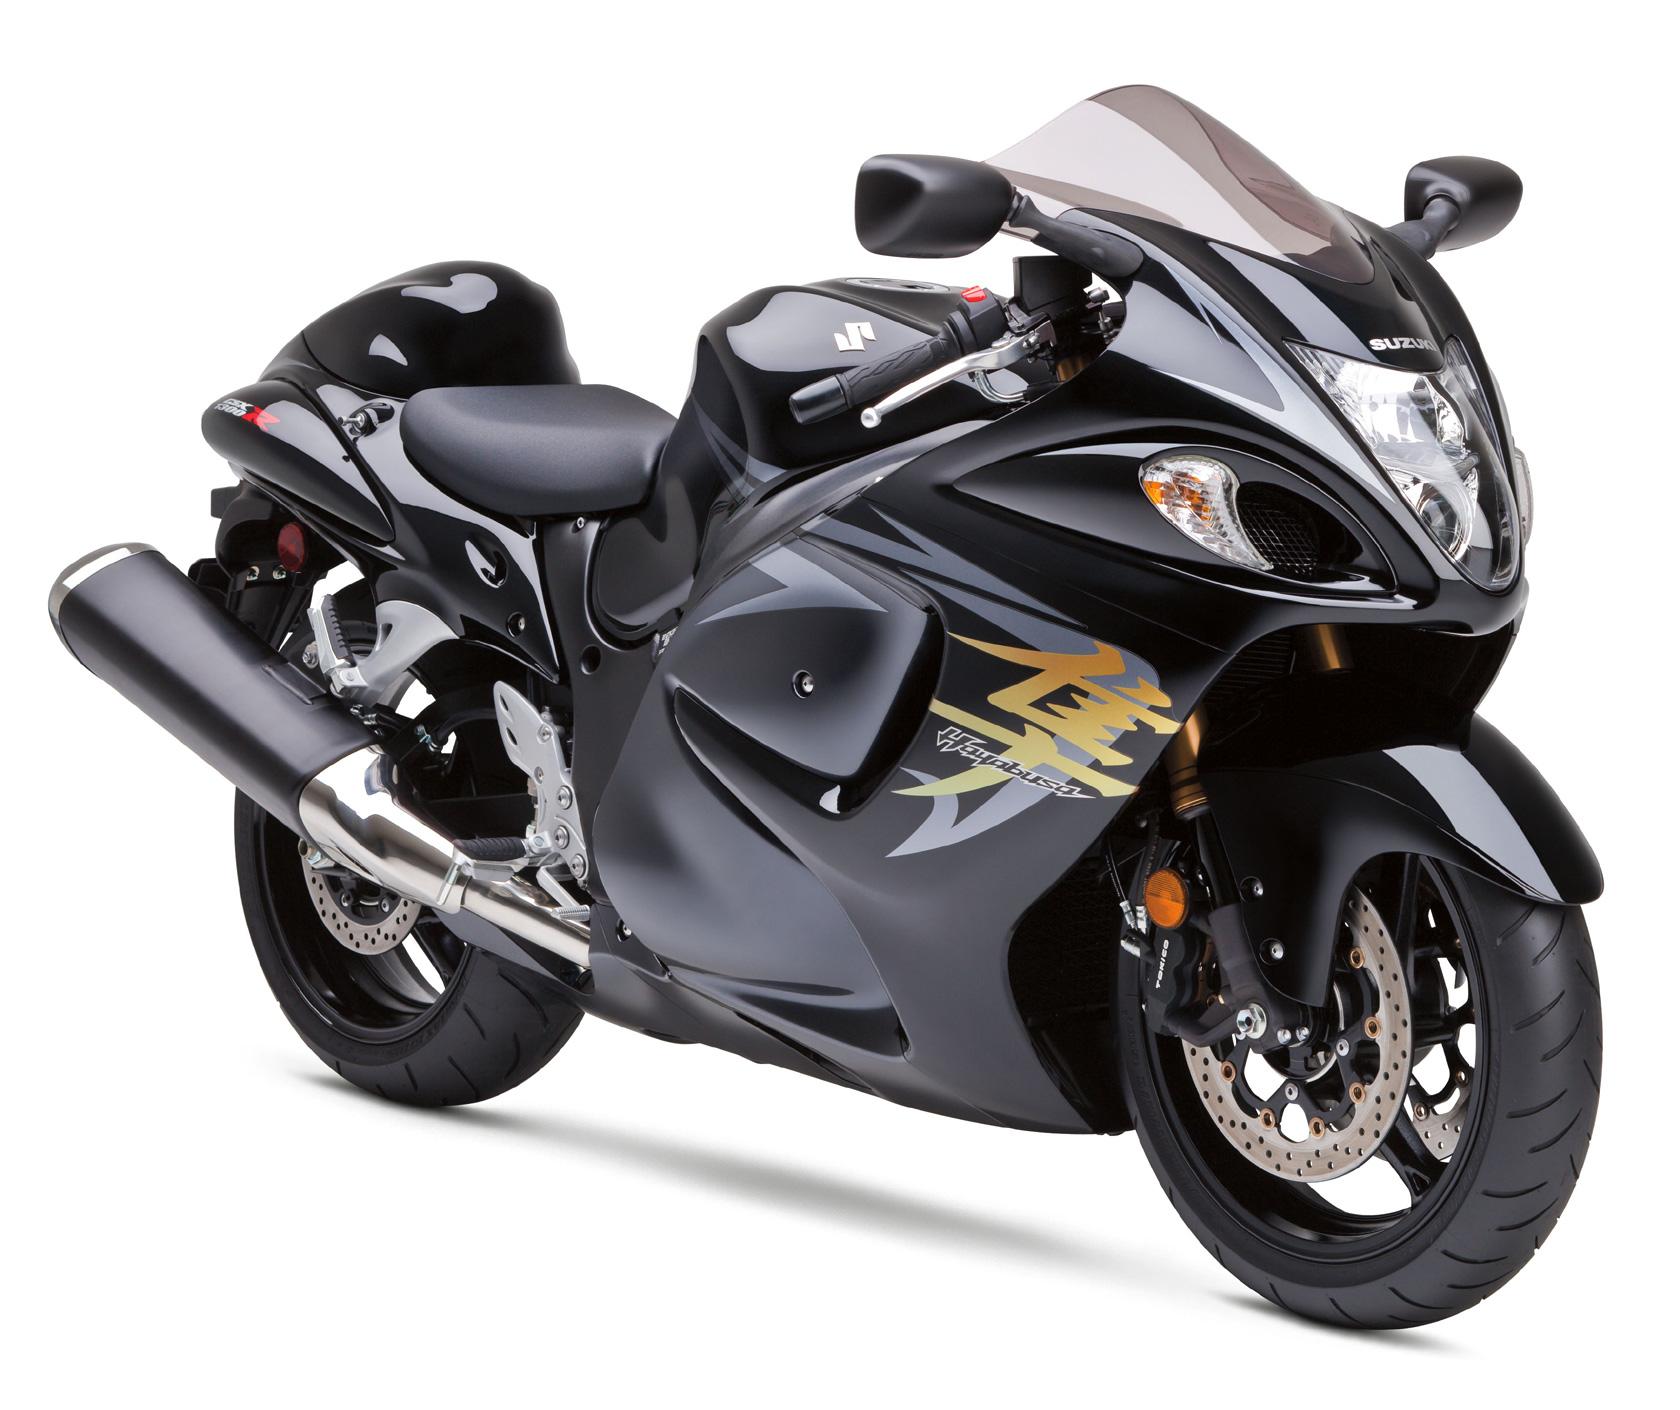 2009-Suzuki-HayabusaGSX1300Rc.jpg